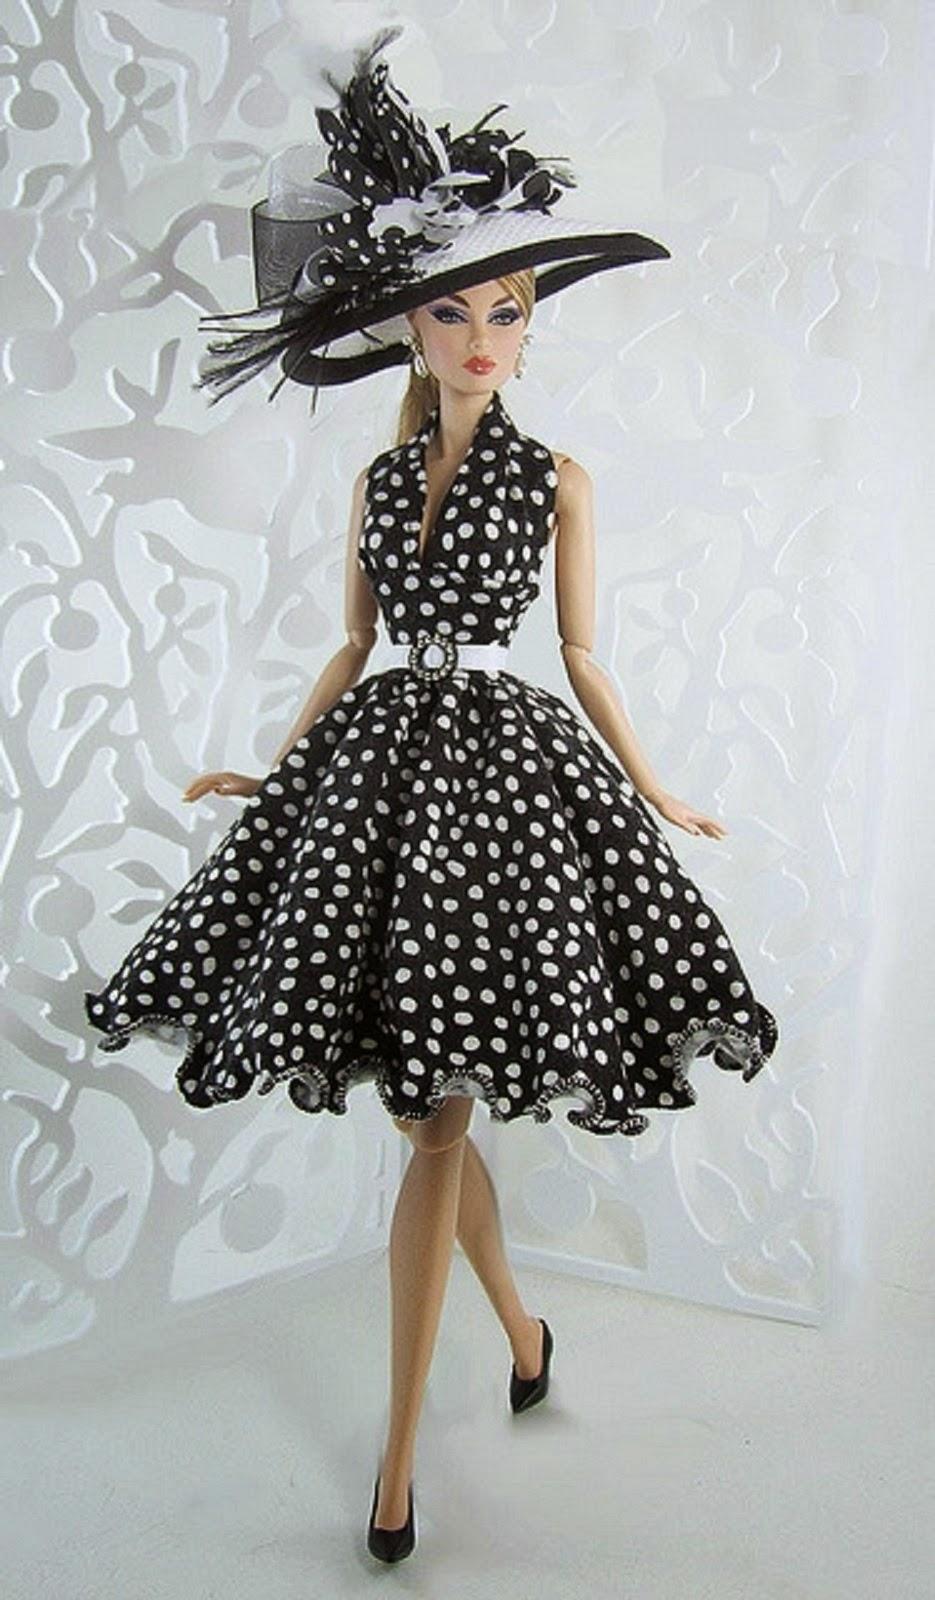 Cute Love Dolls Hd Wallpapers Very Cute And Beautiful Barbie Dolls Hd Wallpaper All 4u